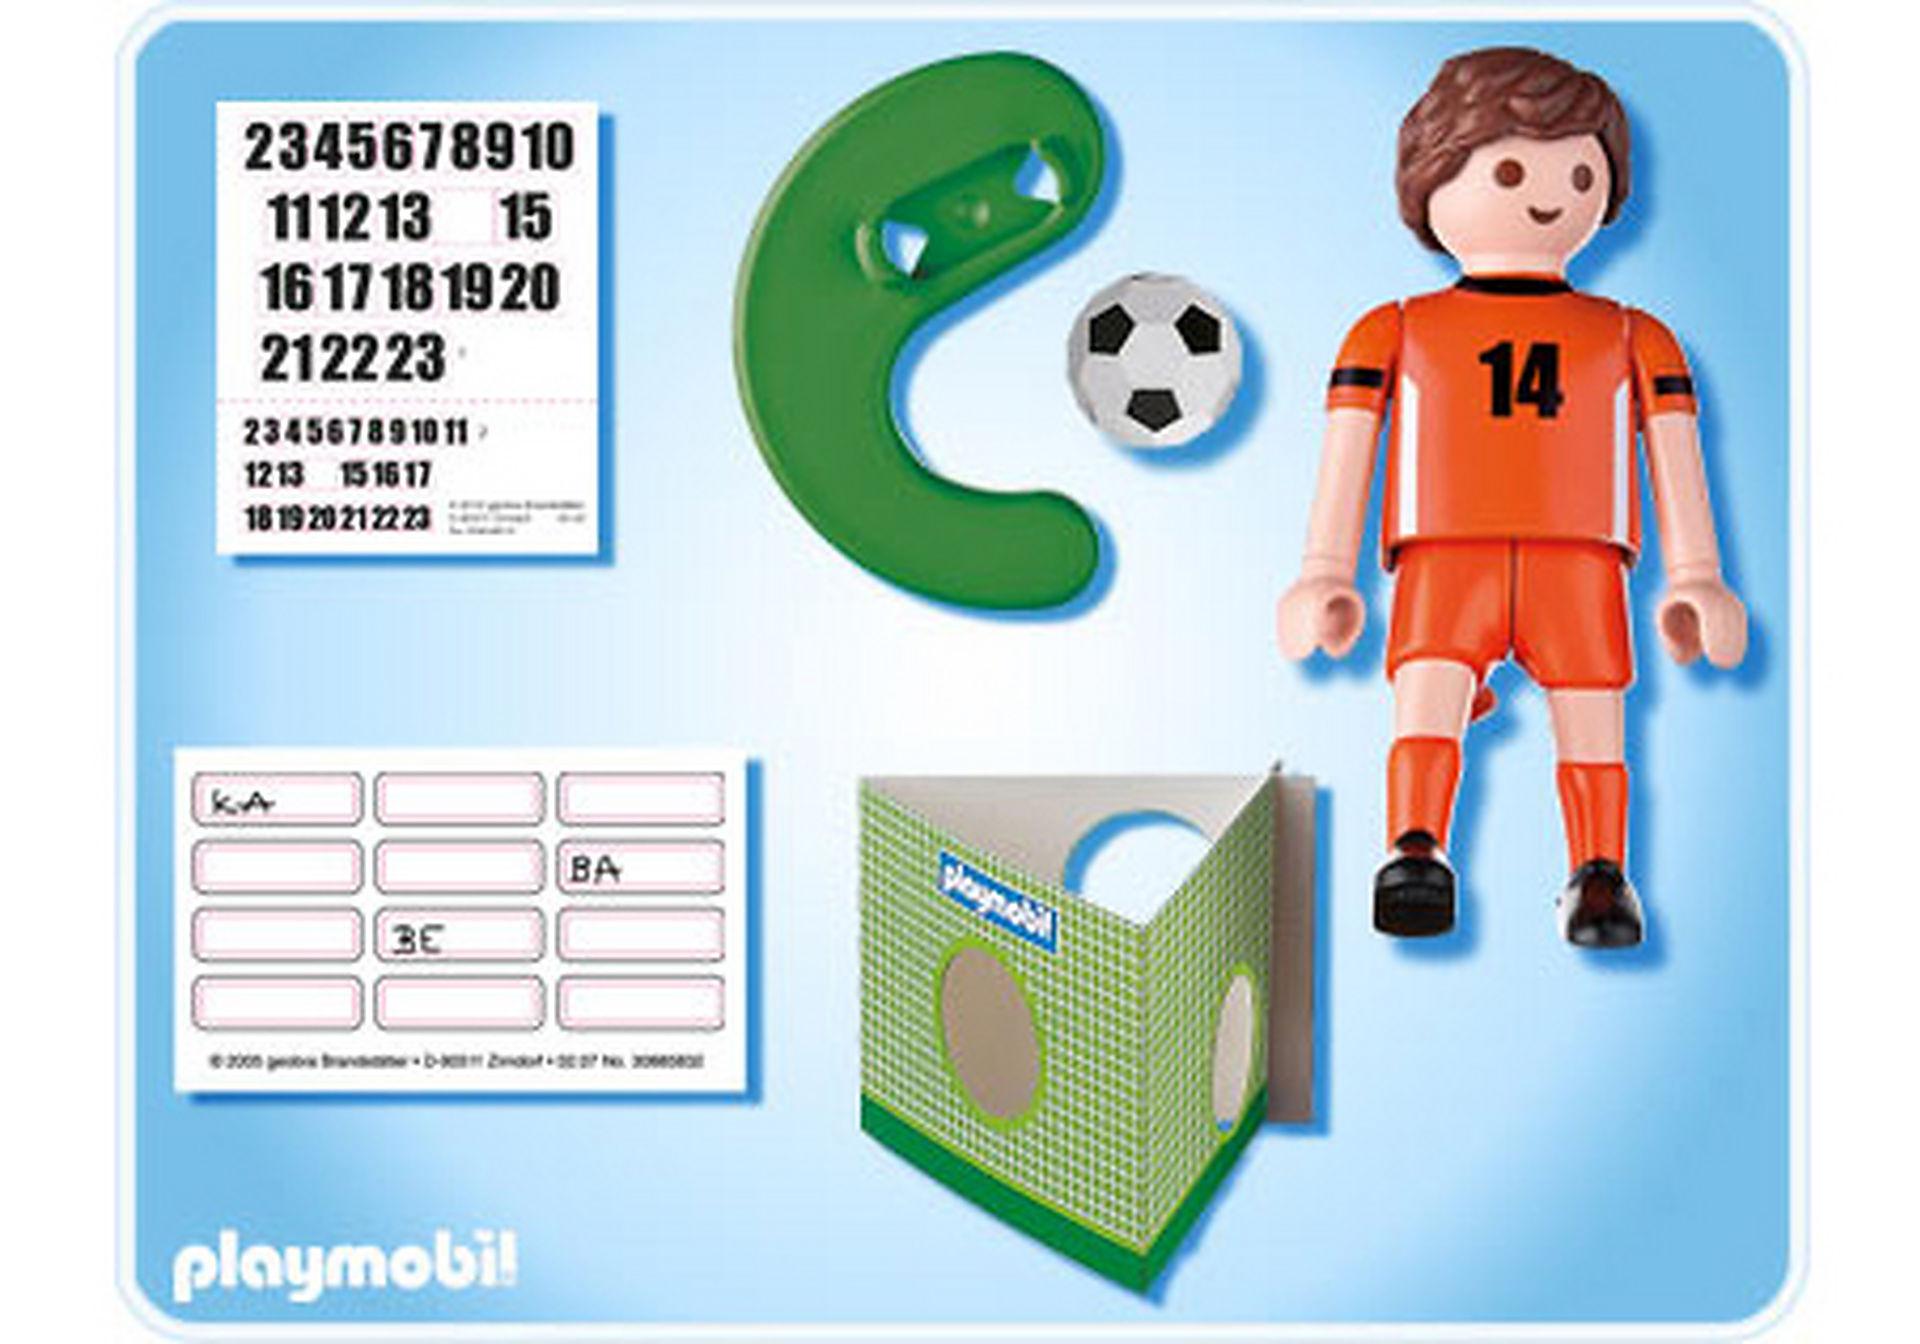 4735-A Fußballspieler Niederlande zoom image2